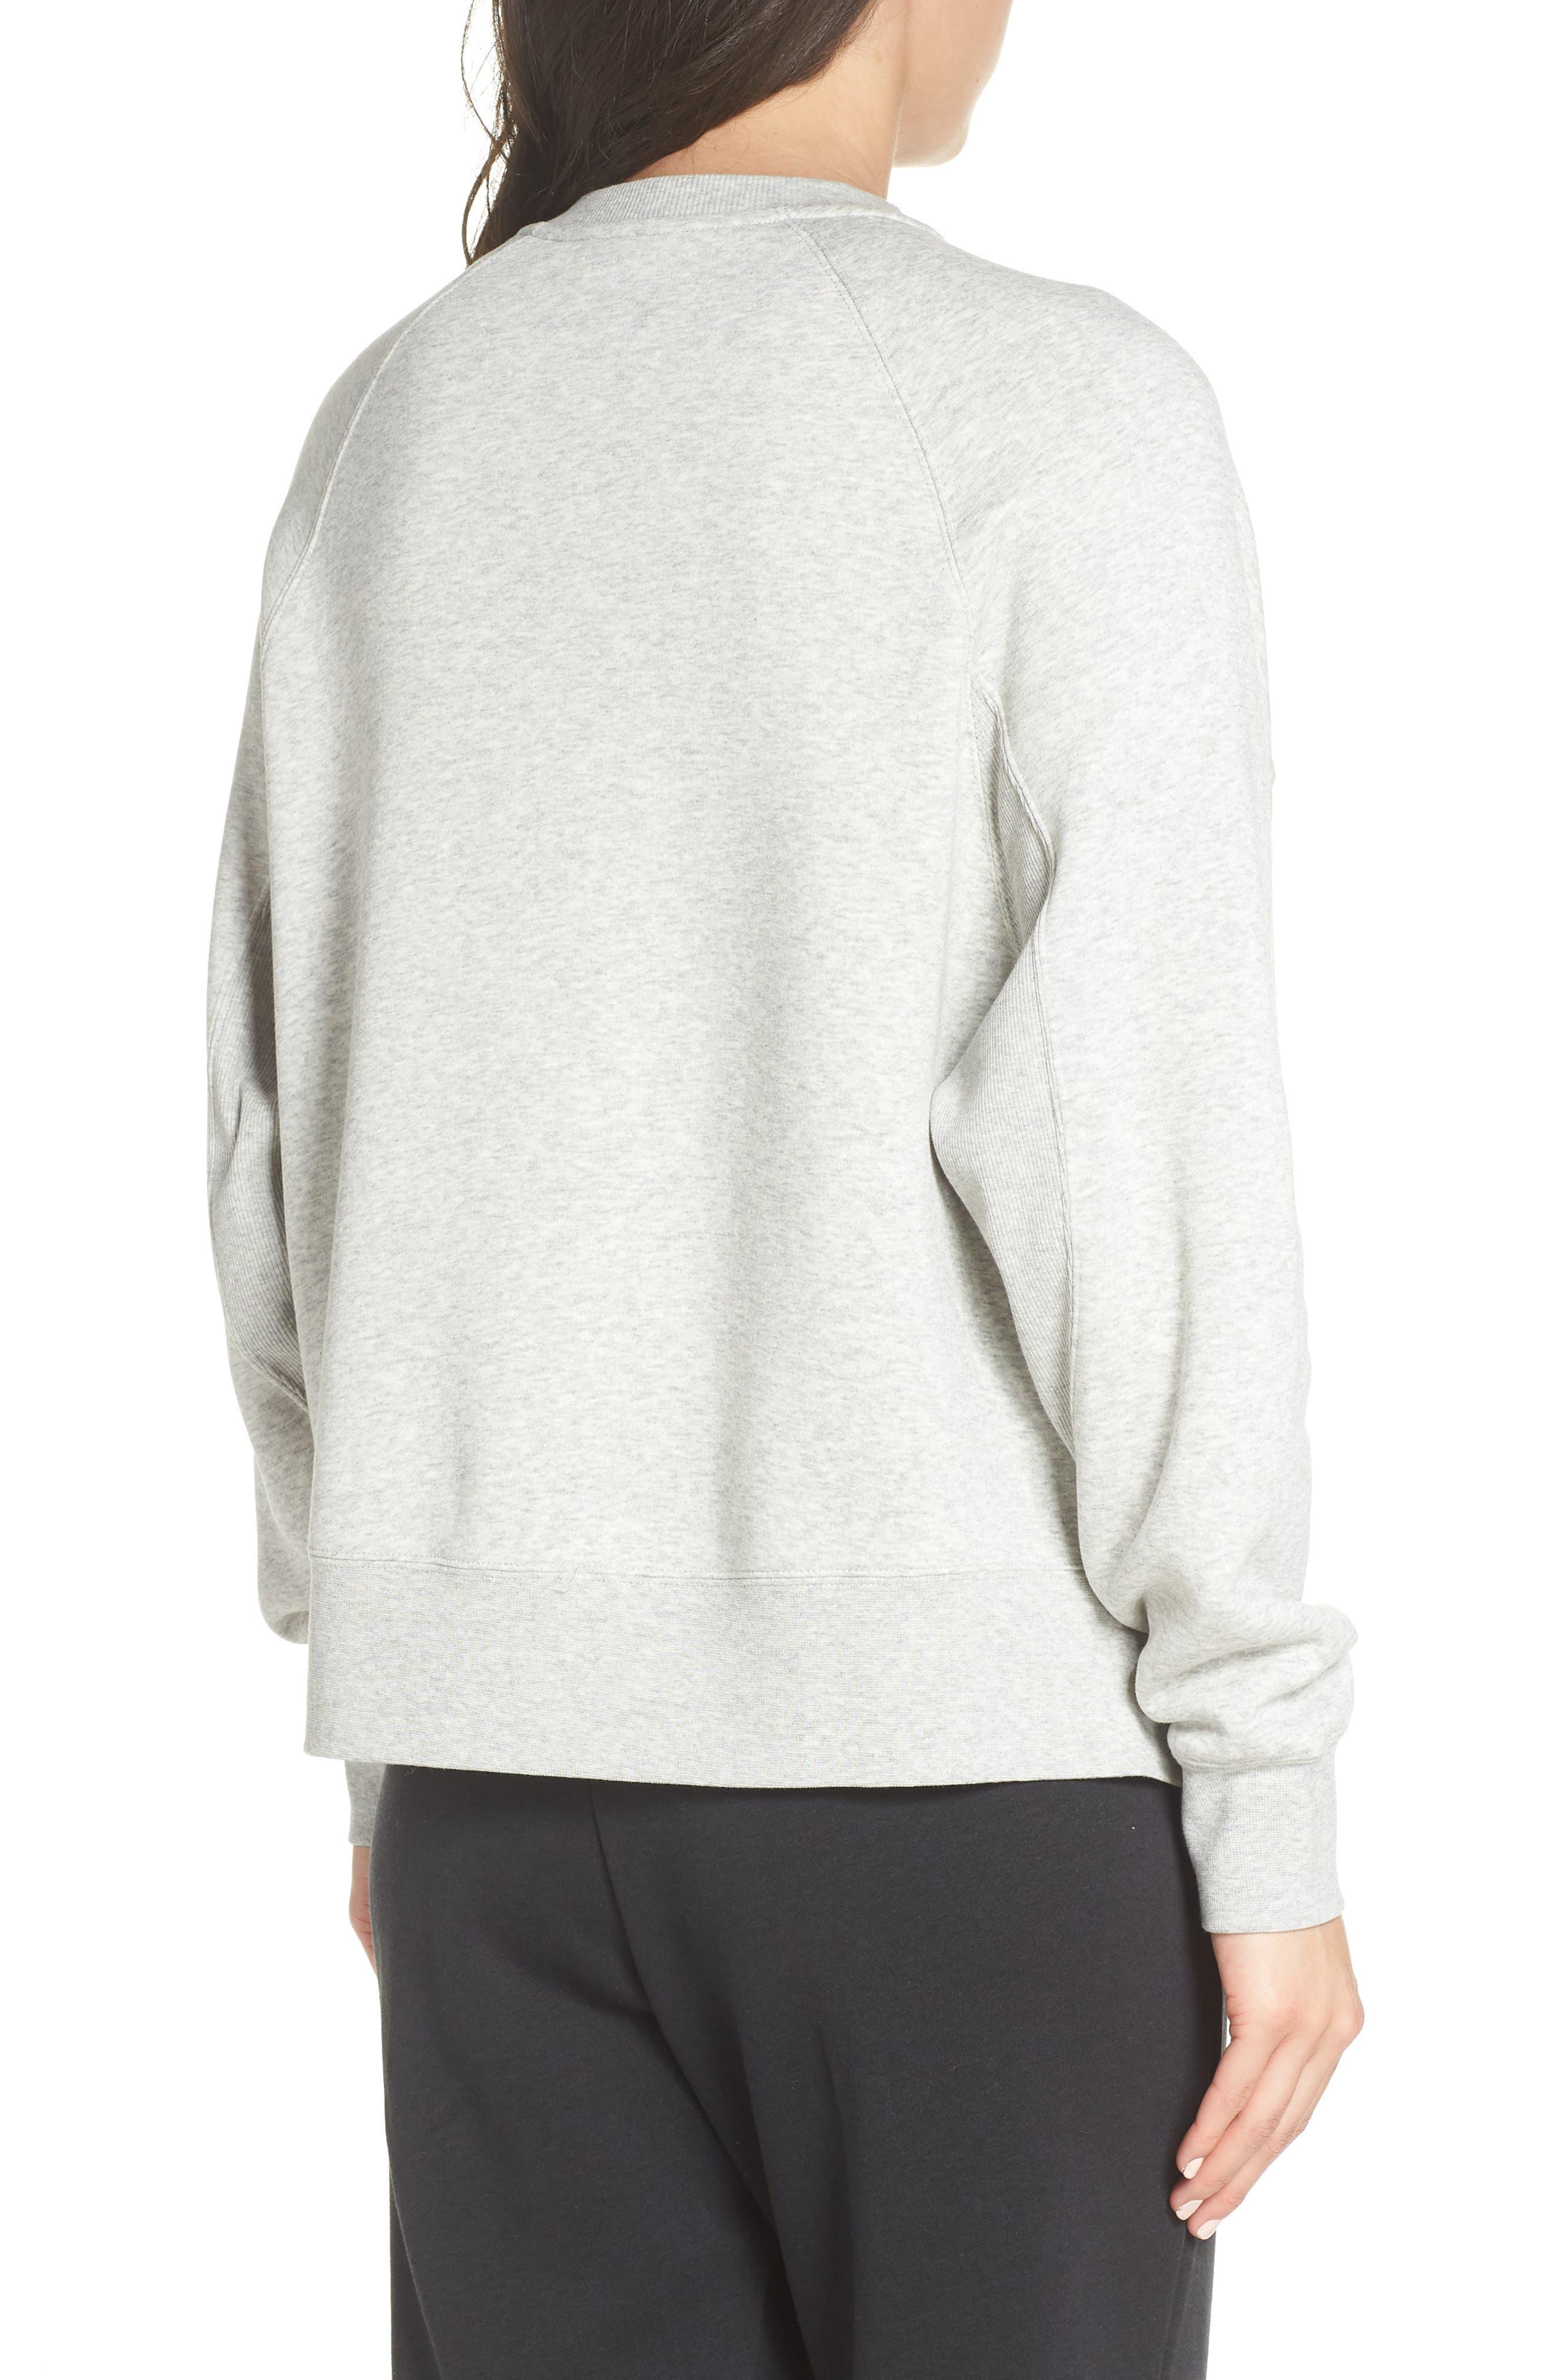 Sportswear Rally Sweatshirt,                             Alternate thumbnail 2, color,                             GREY HEATHER/ WHITE